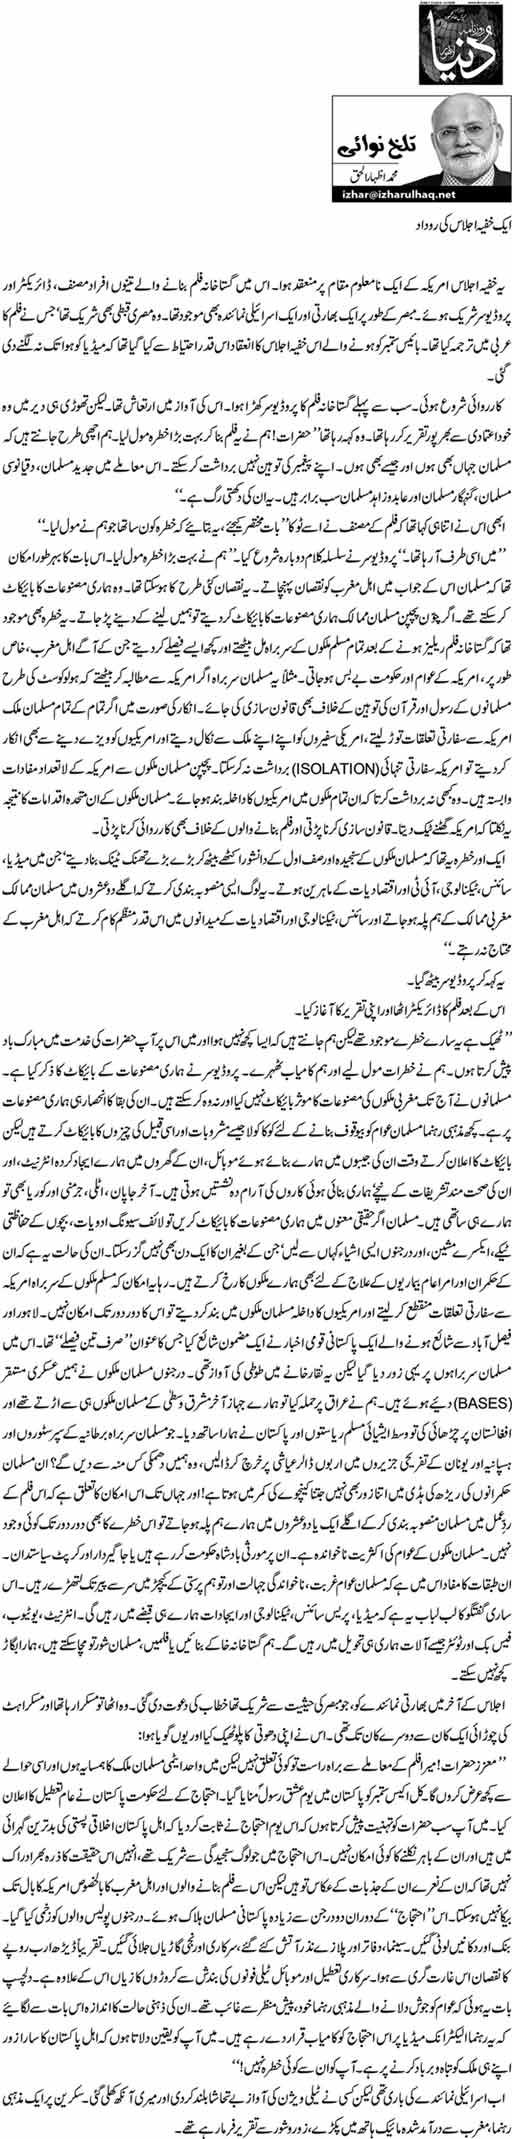 Aik khufya ijlas ki rudad - M. Izhar ul Haq